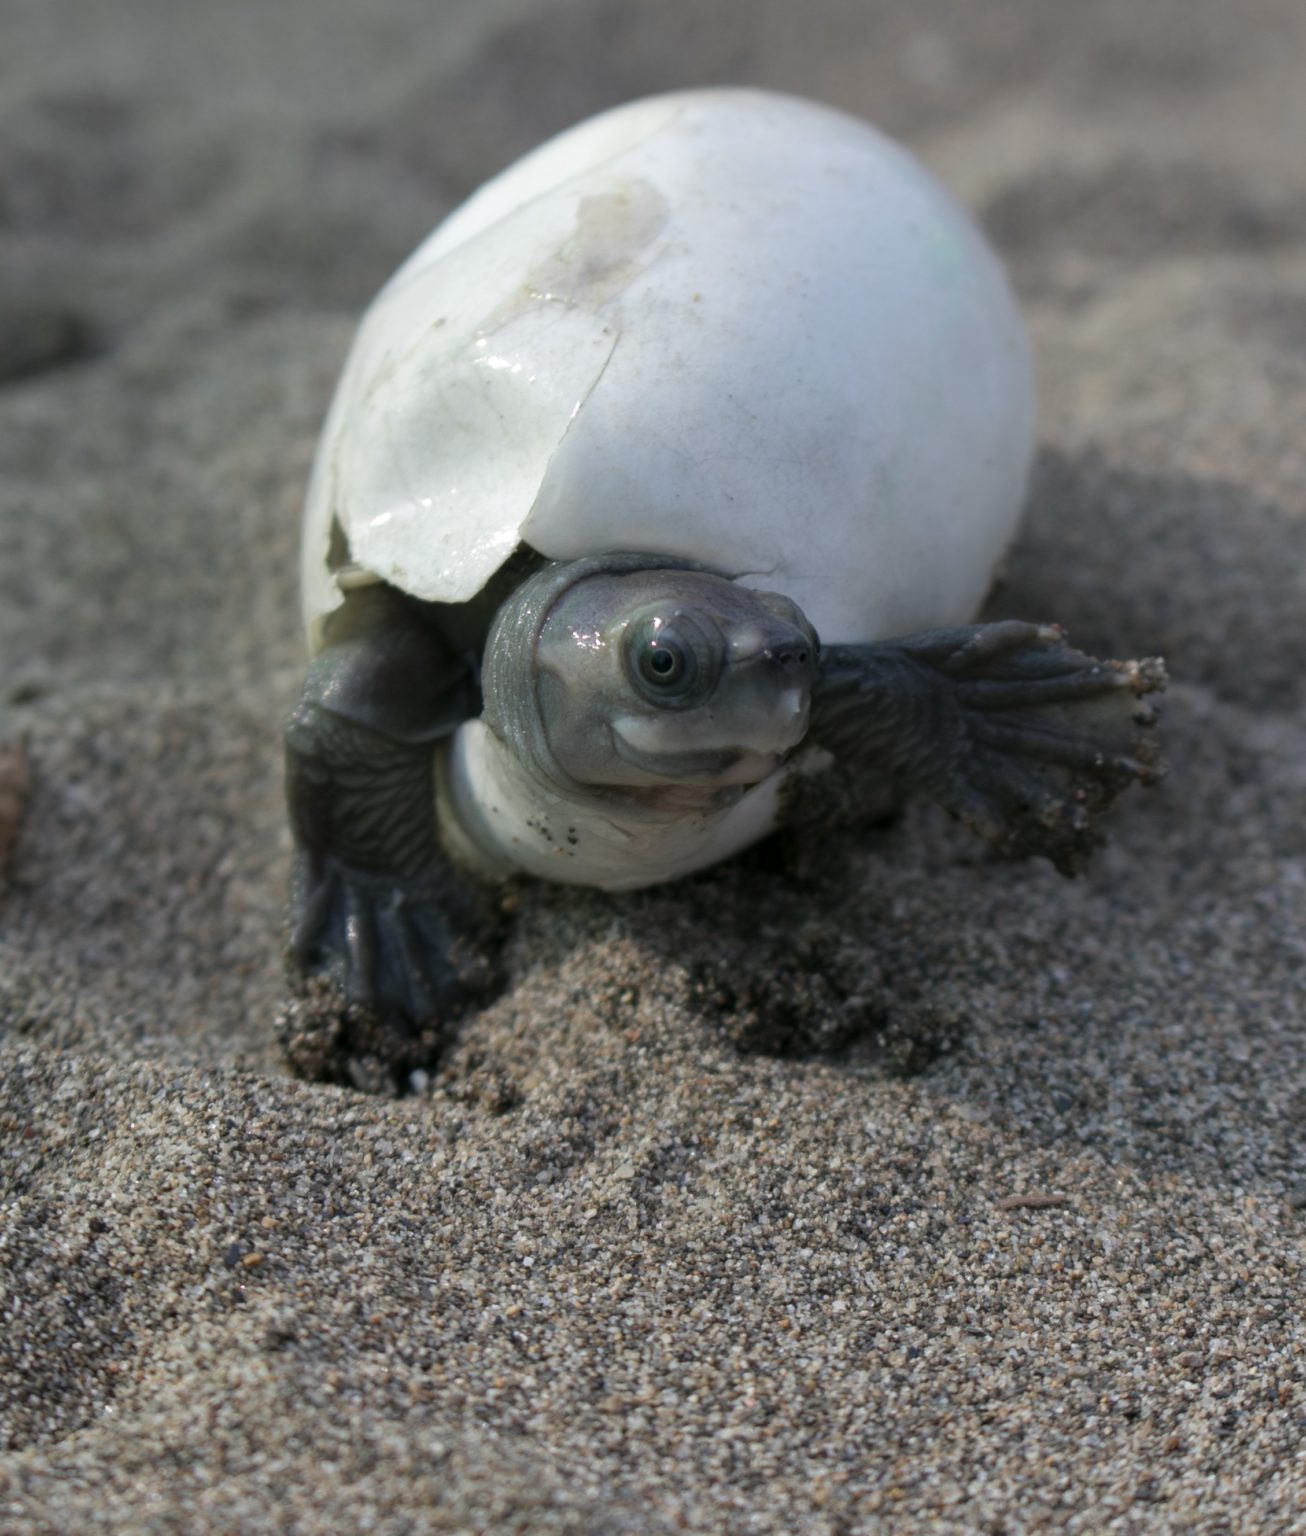 burmese-roofed-turtle-hatchling3-credit-myo-min-winwcs-myanmar-1306x1536-1